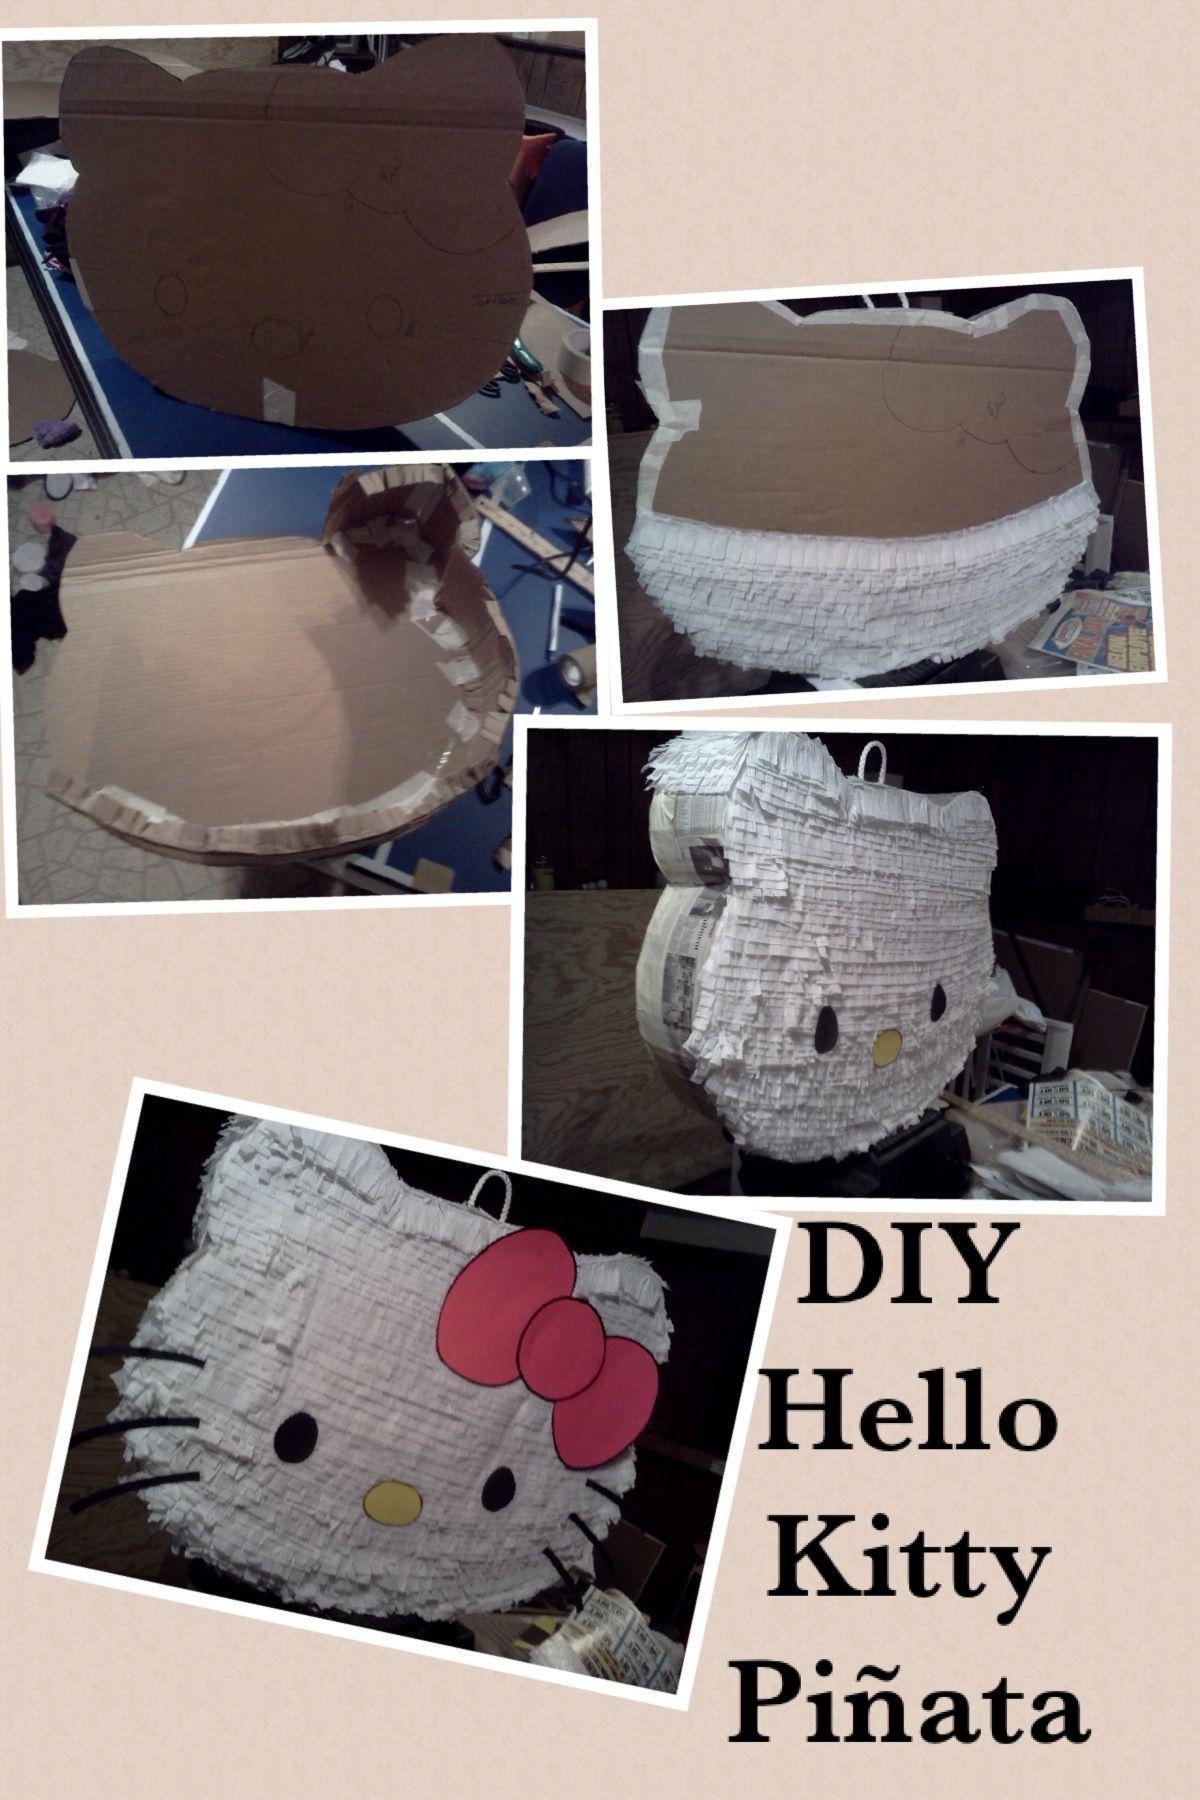 hello kitty pi ata my diy pi atas pinterest hello. Black Bedroom Furniture Sets. Home Design Ideas